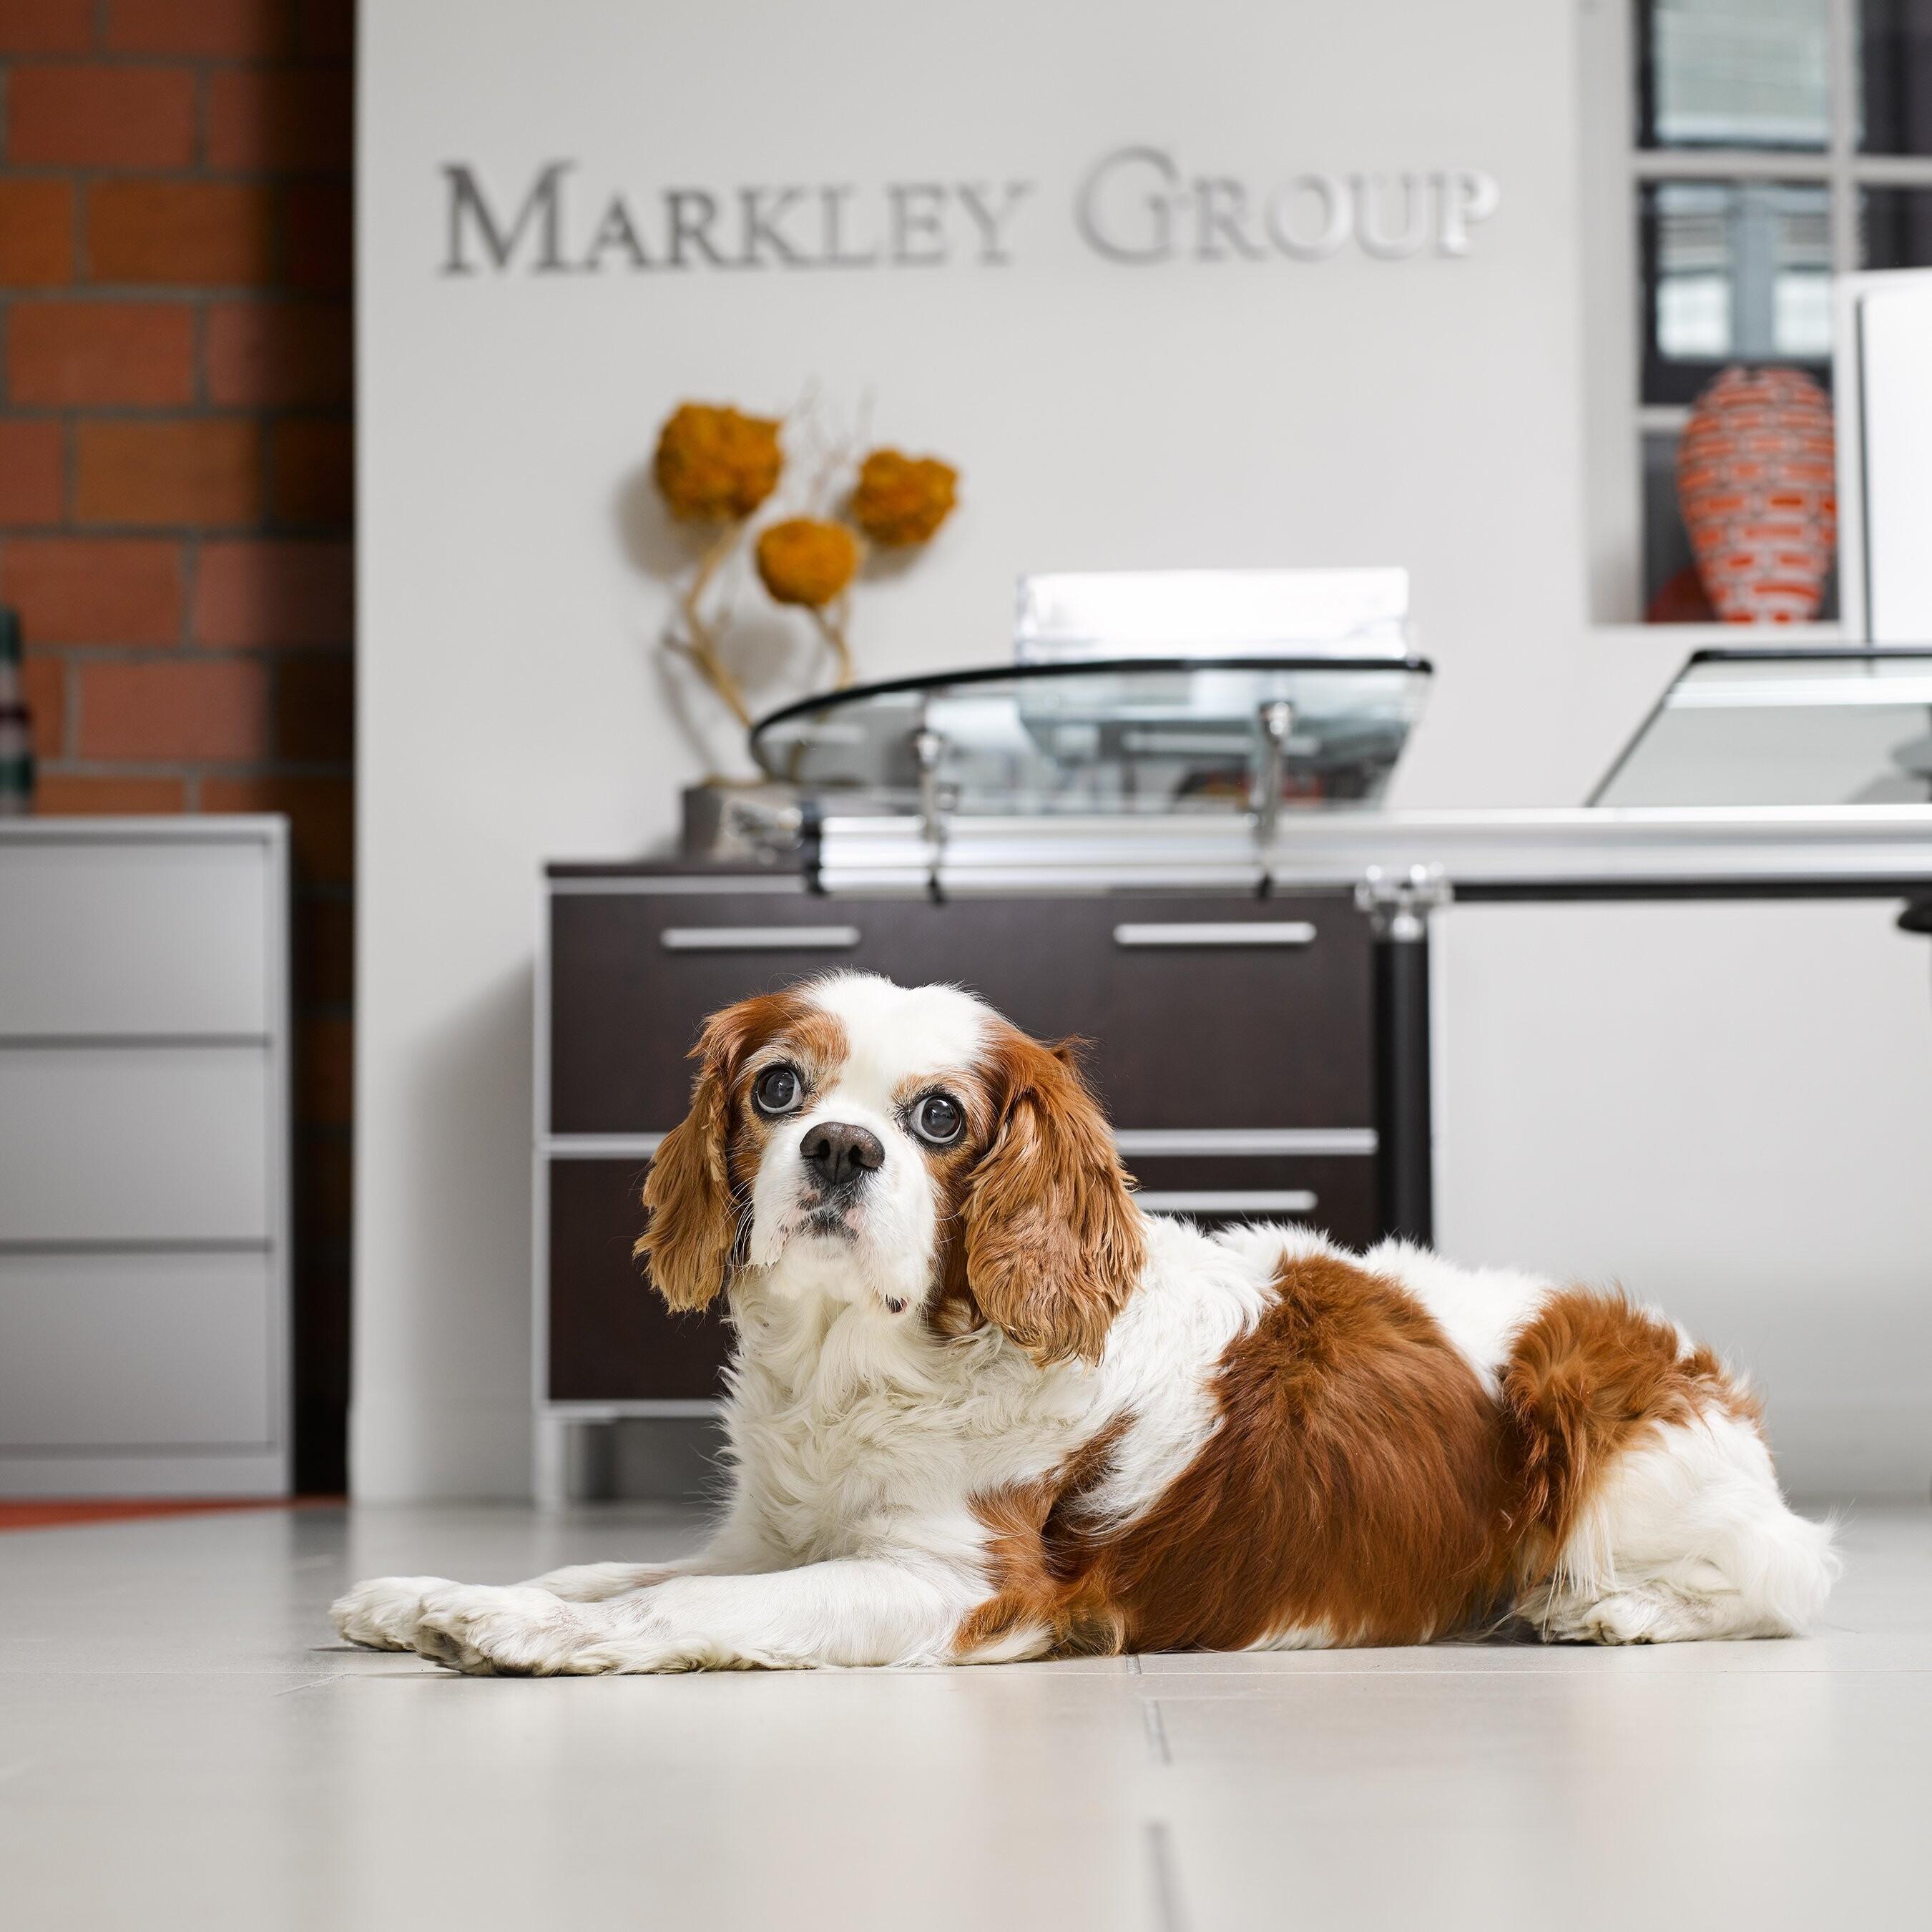 Markley Group